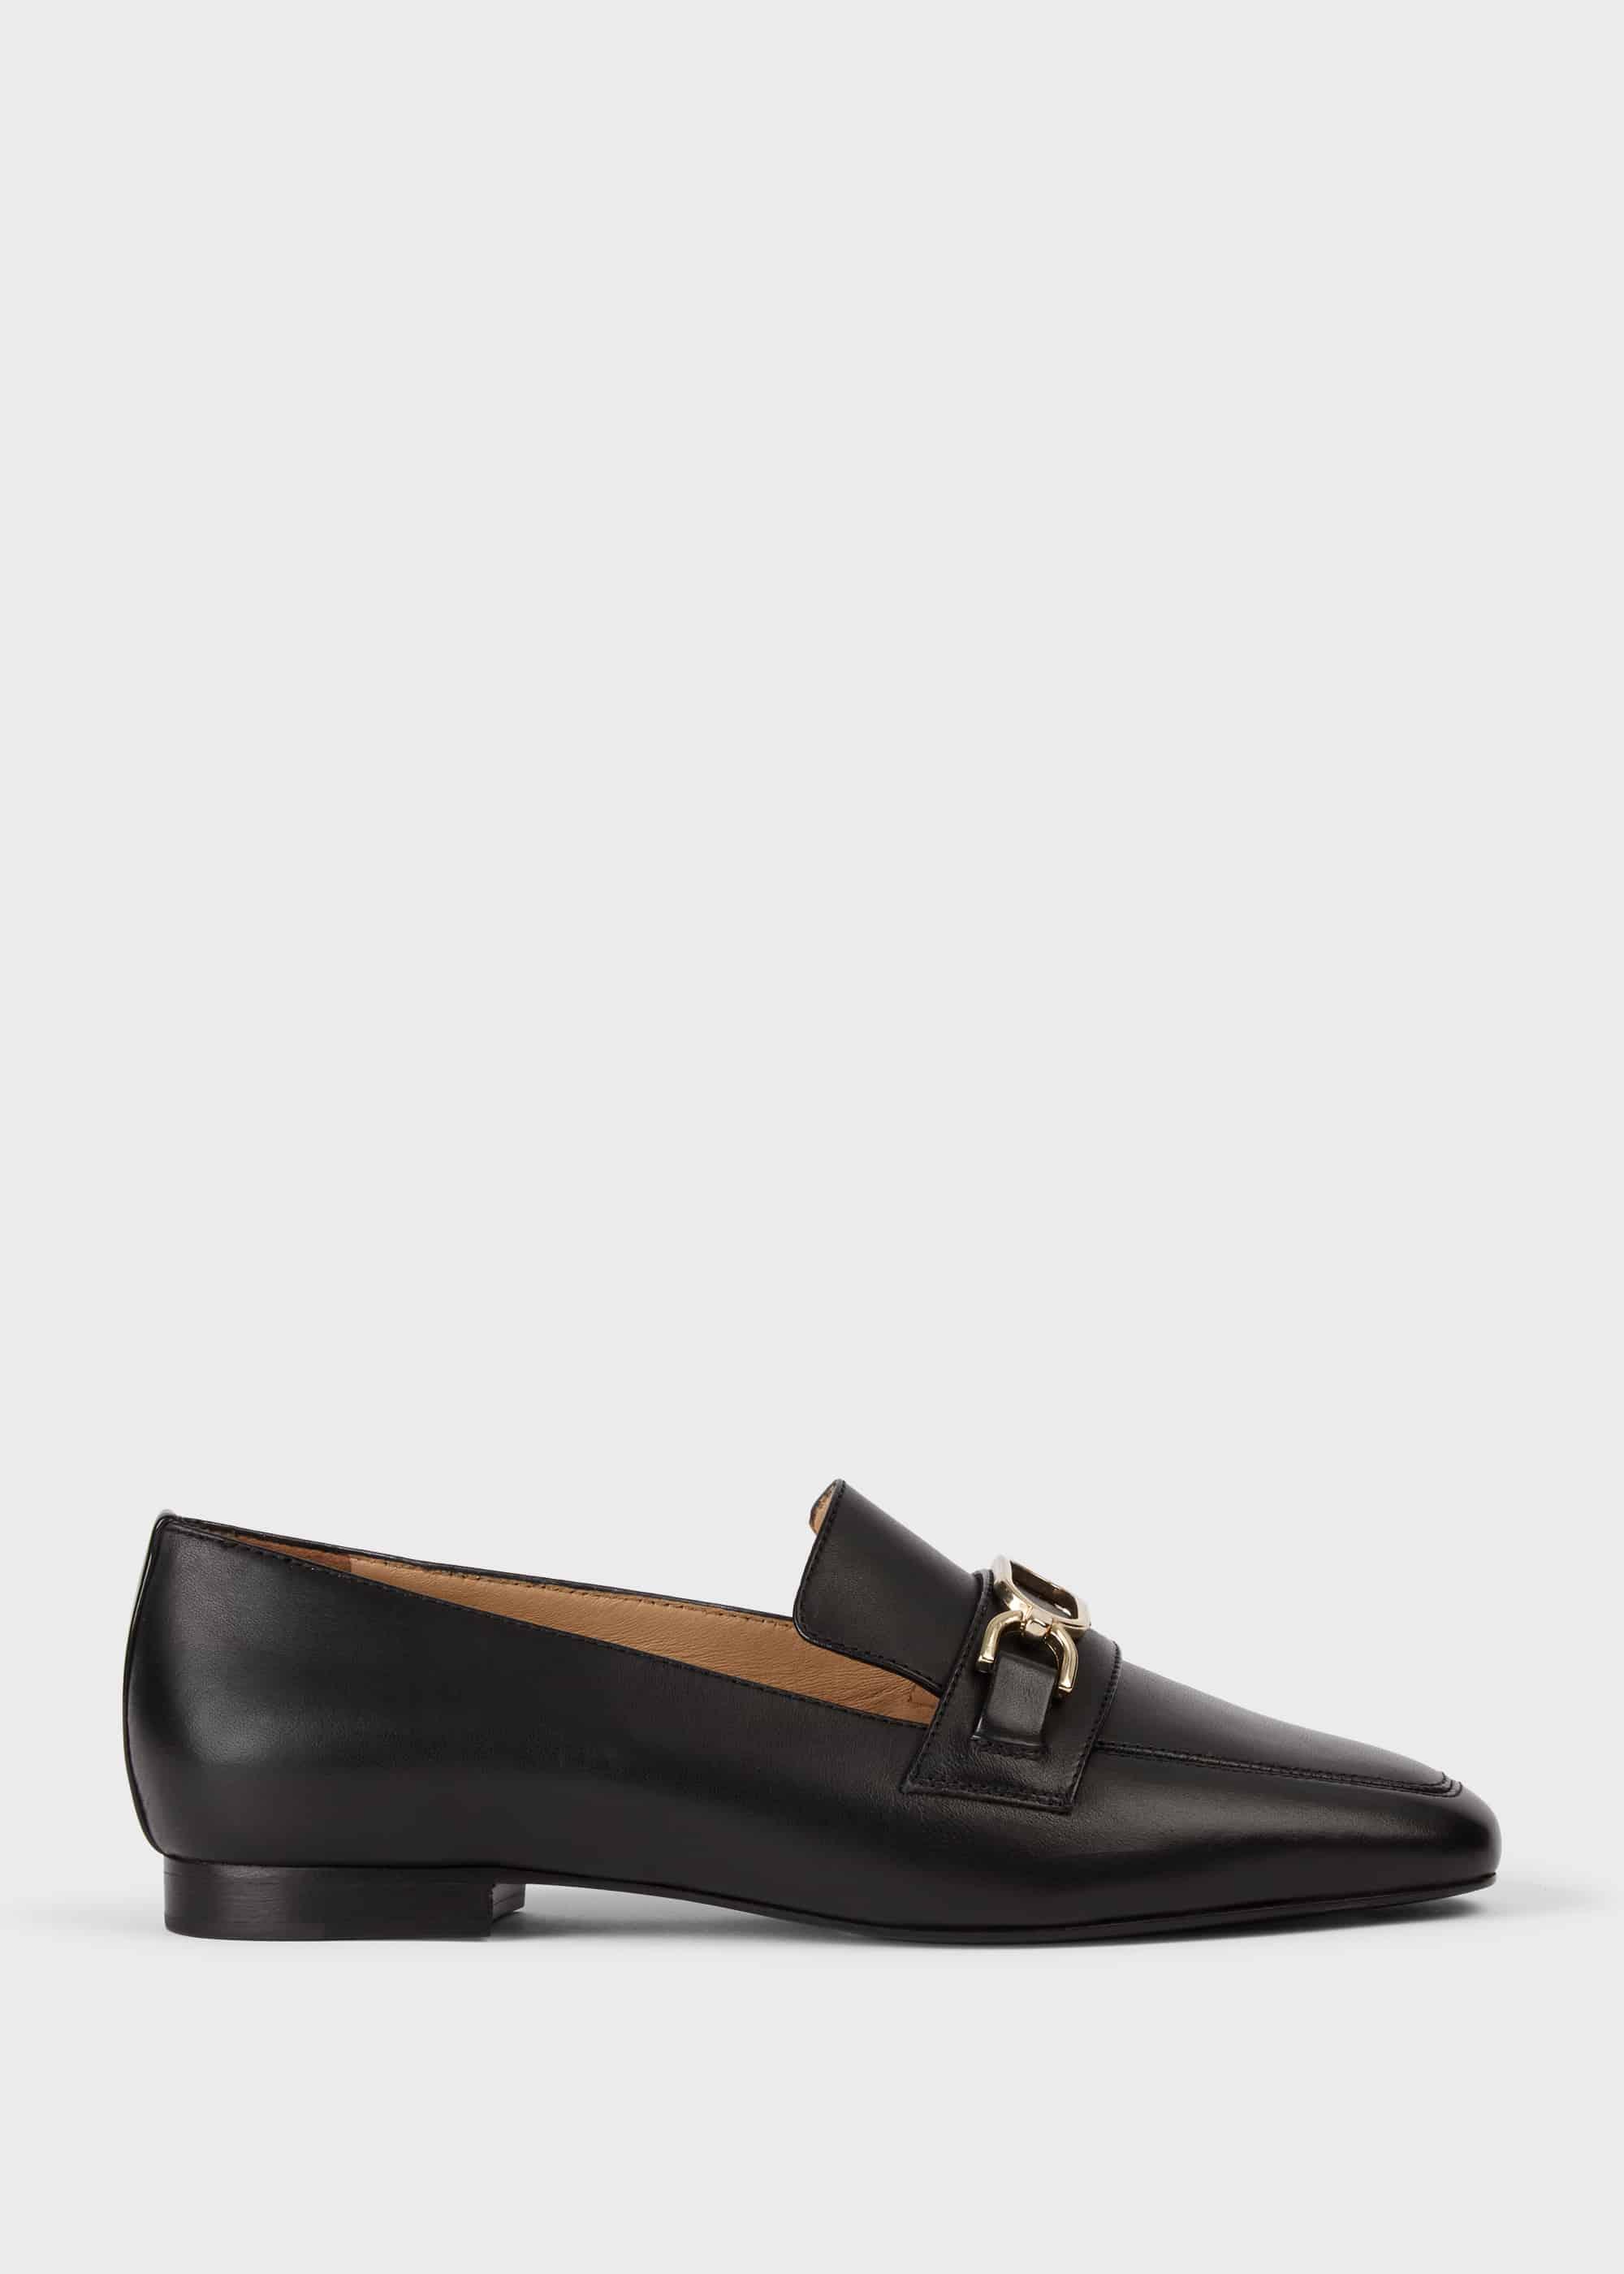 Hobbs Women Alexia Leather Flat Shoes